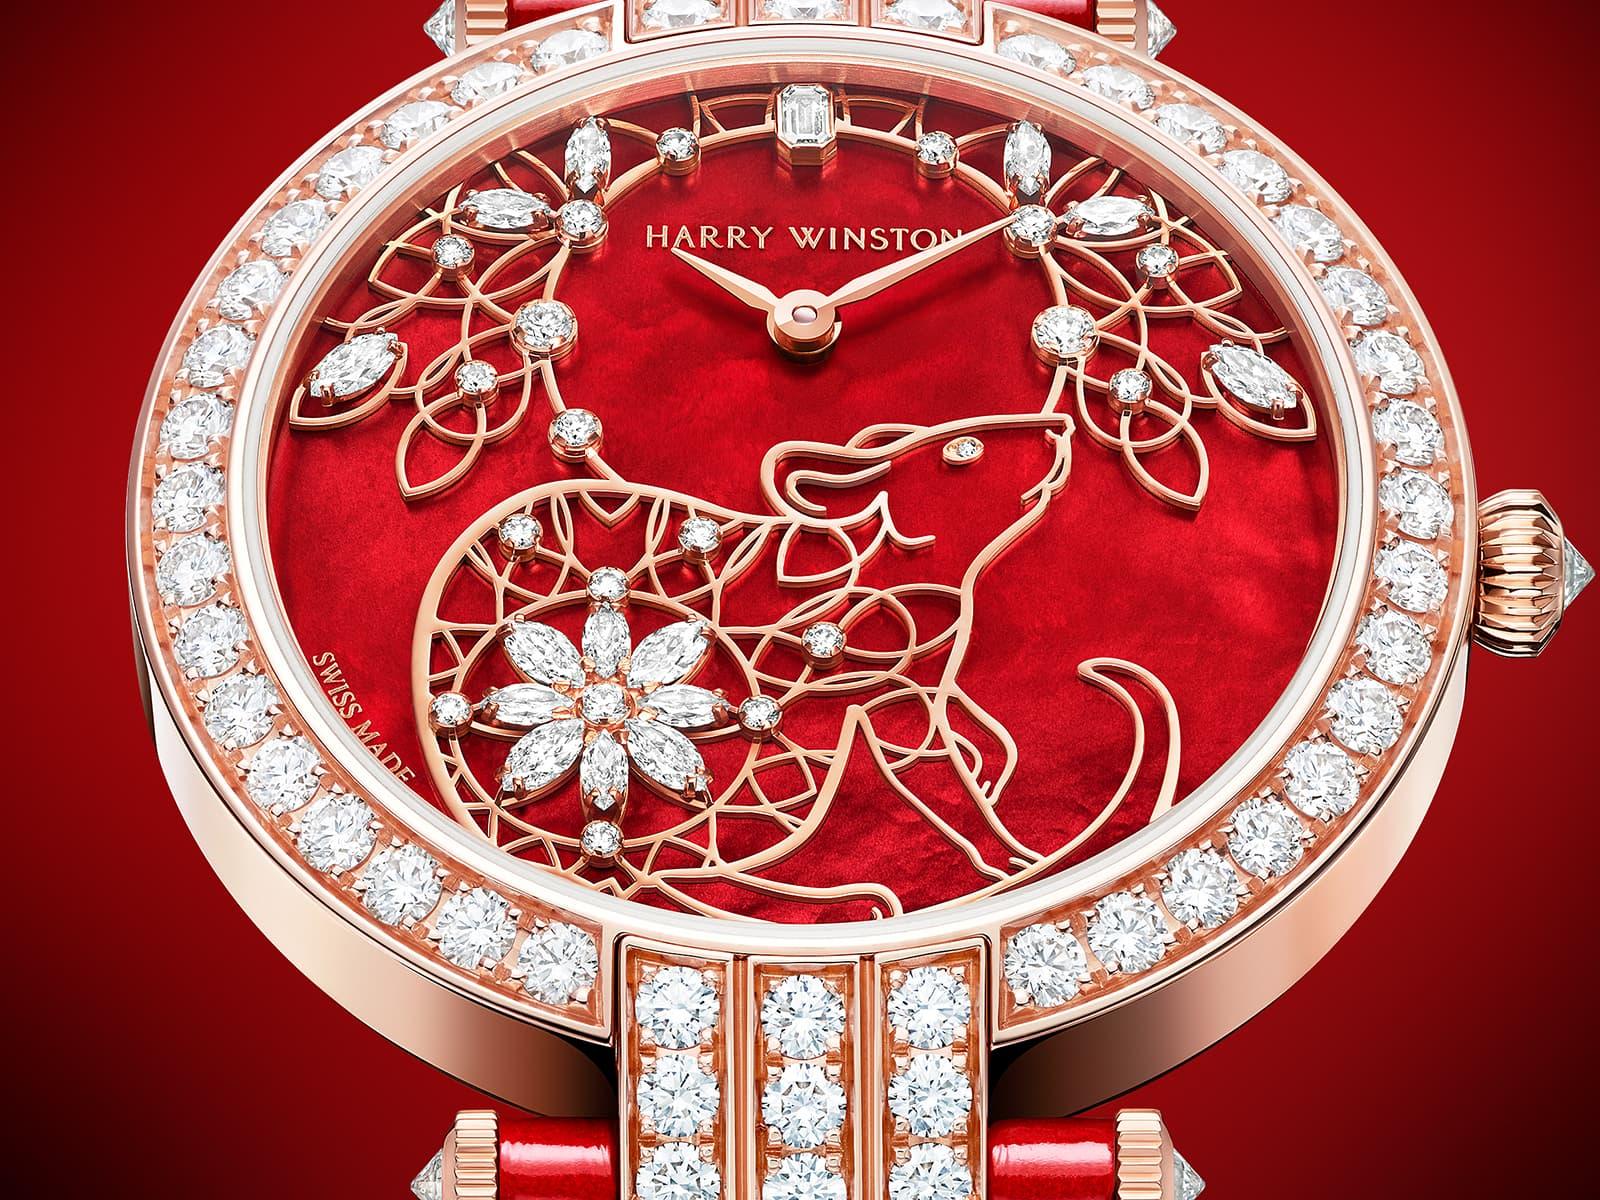 prnahm36rr028-harry-winston-premier-chinese-new-year-automatic-4.jpg